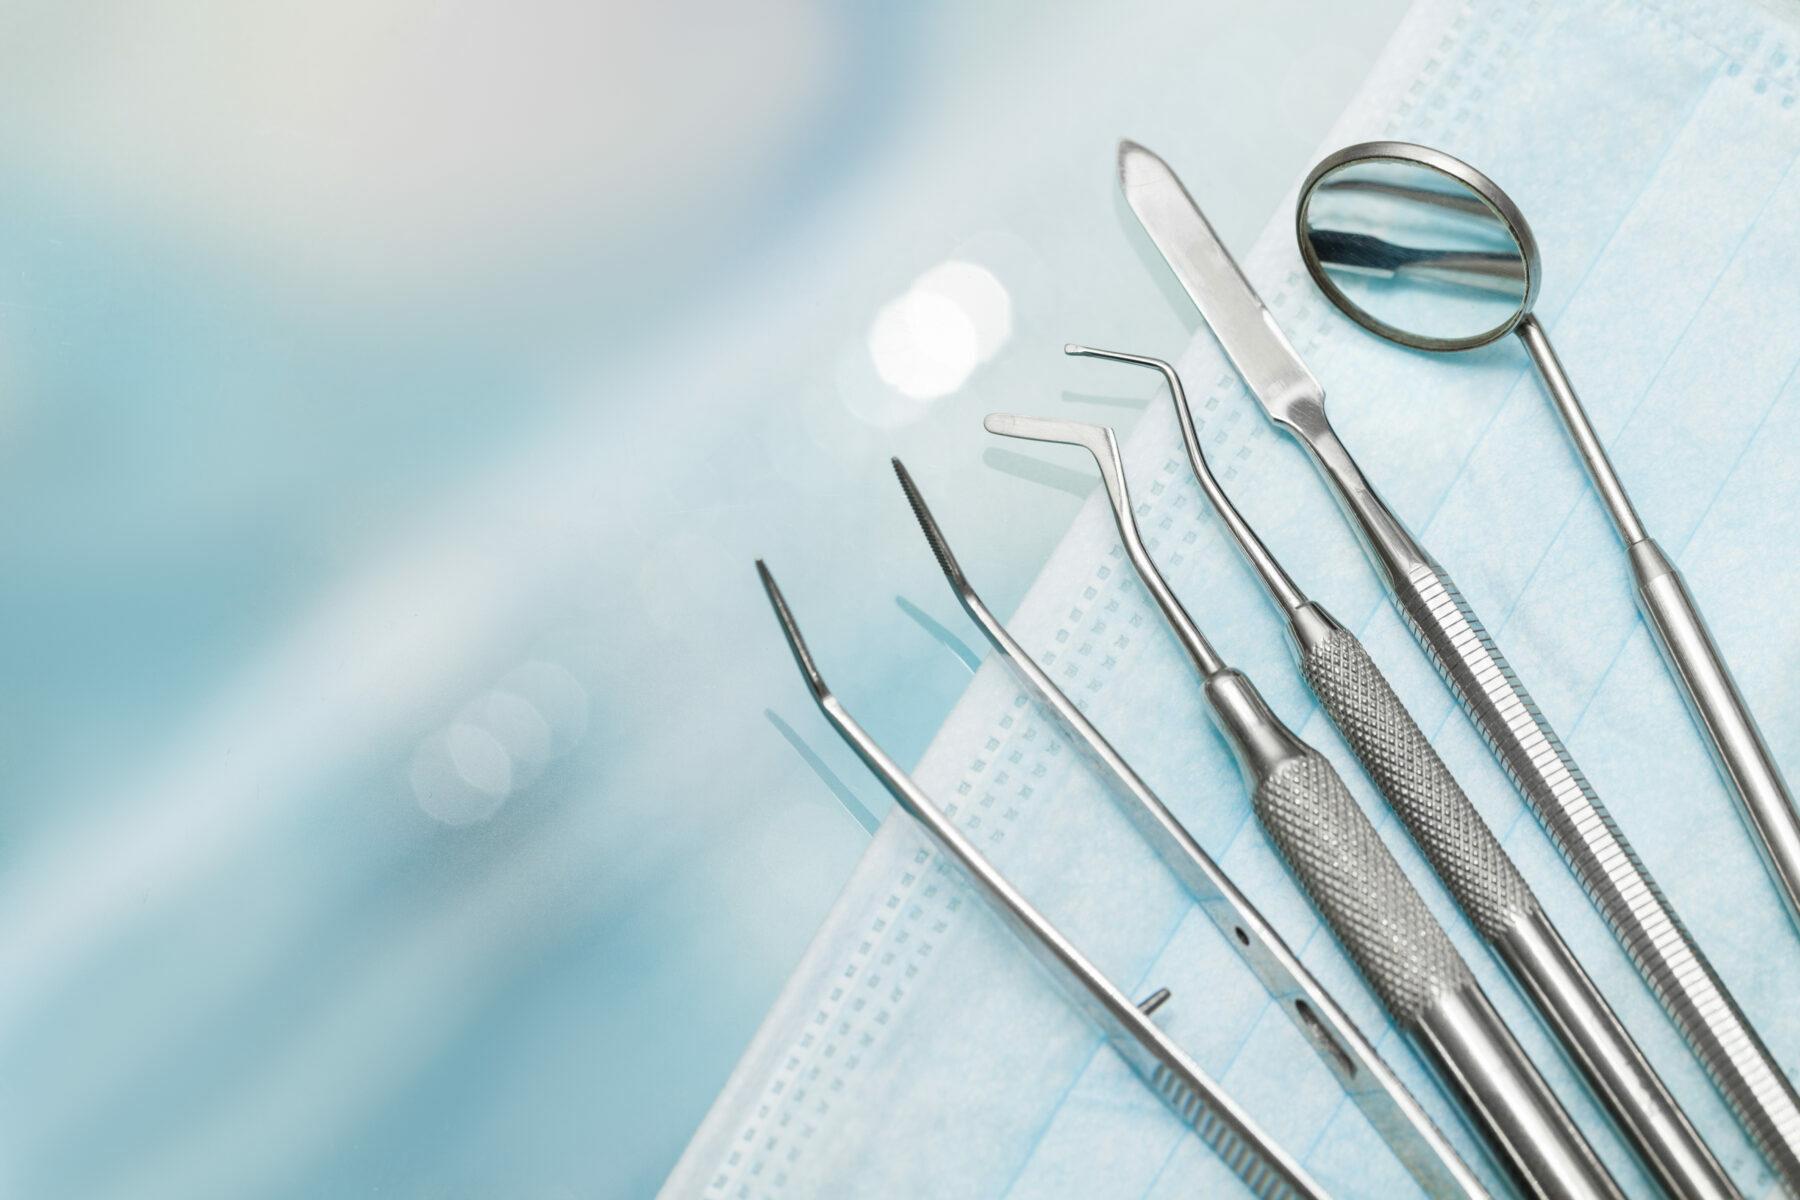 Esame attitudinale per assistente dentale – sabato 27 marzo 2021